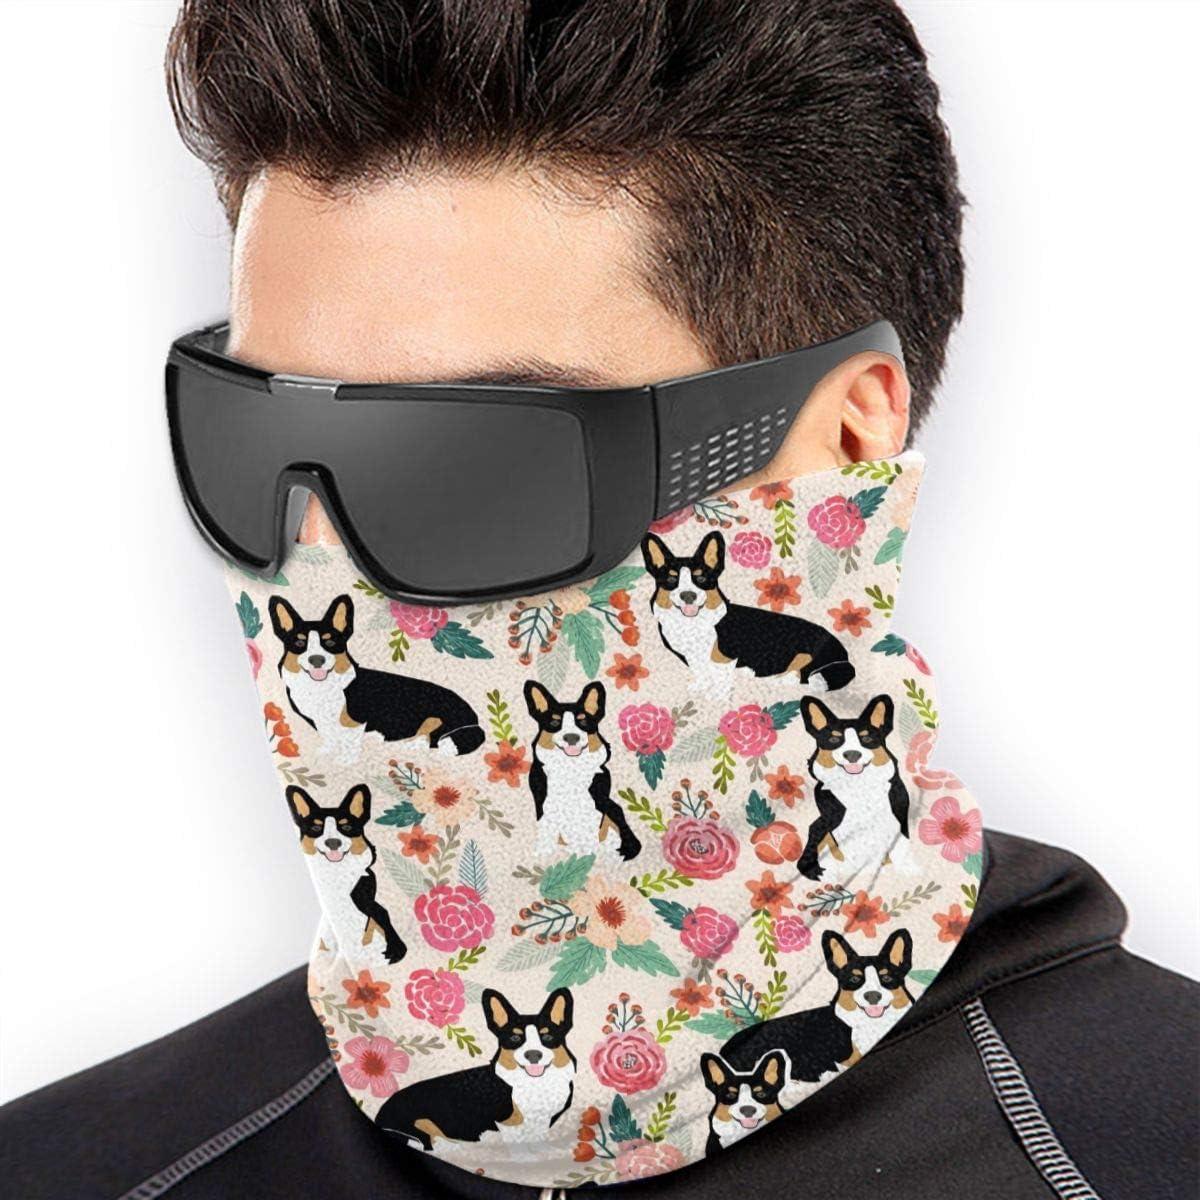 Headband Fishing Mask Galaxy Unicorn Cooling Face Scarf Cover Mask Neck Gaiter Motorcycle Face Cover for Men Women Reusable Breathable Bandana Balaclava